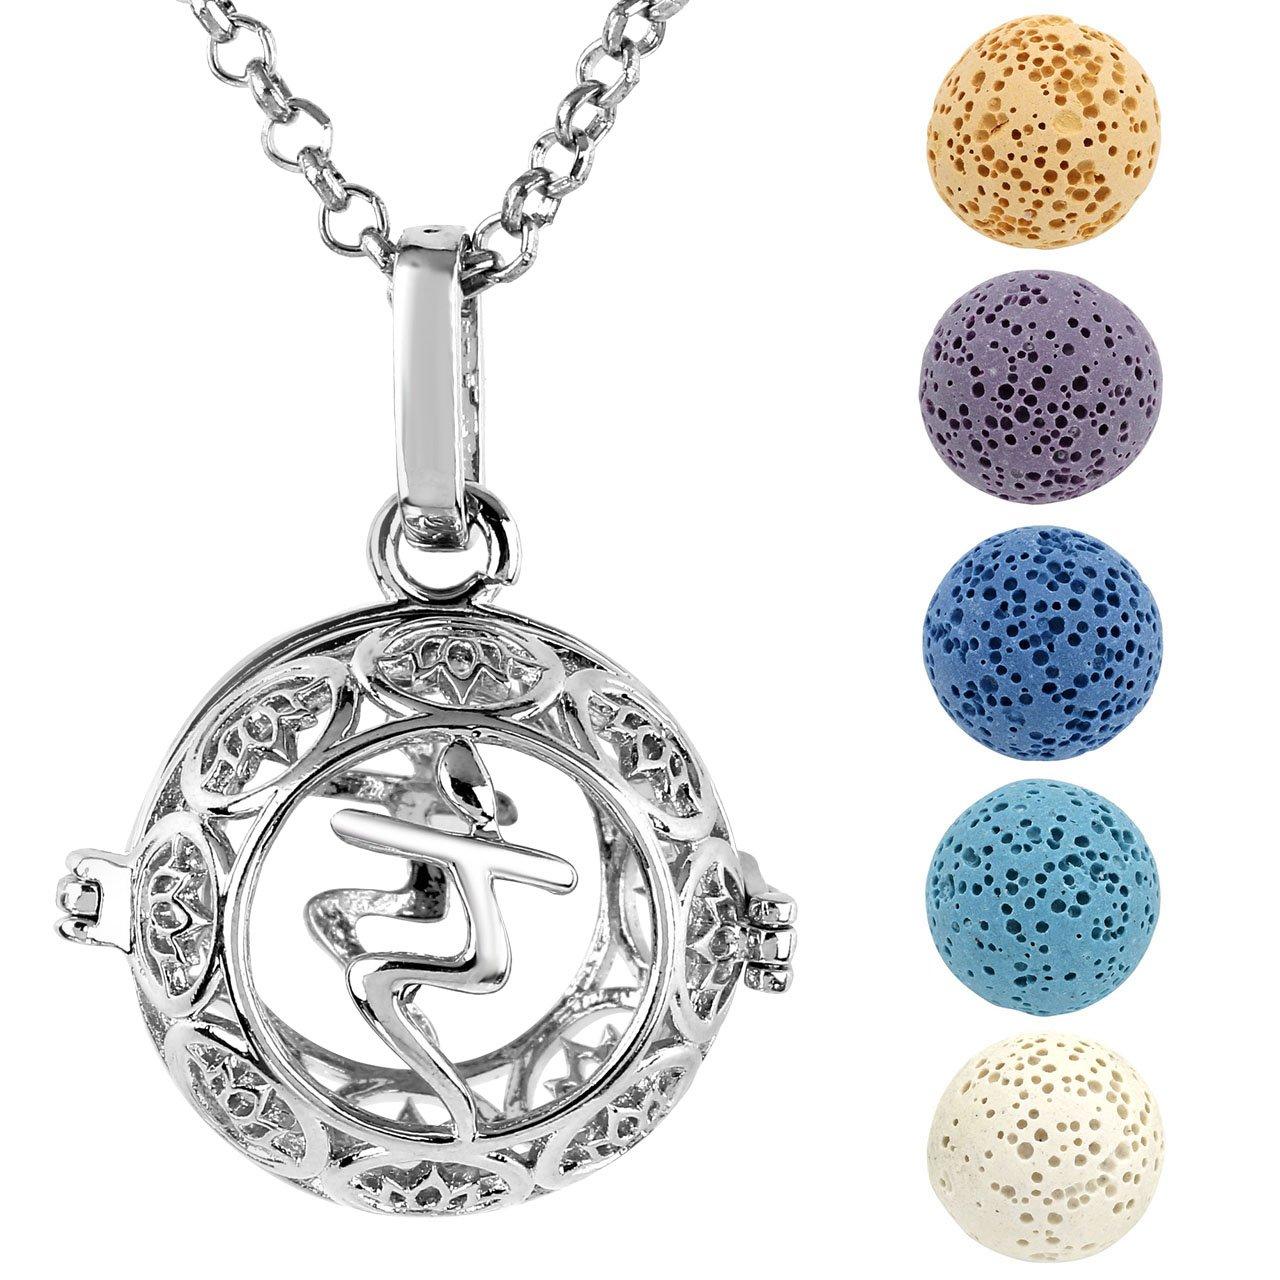 JOVIVI Aromatherapie Kette Ätherische Öle Parfum Diffusor Medaillon Halskette Chakra Sanskrit Ram Locket Käfig Anhänger mit 5X Lavasteine